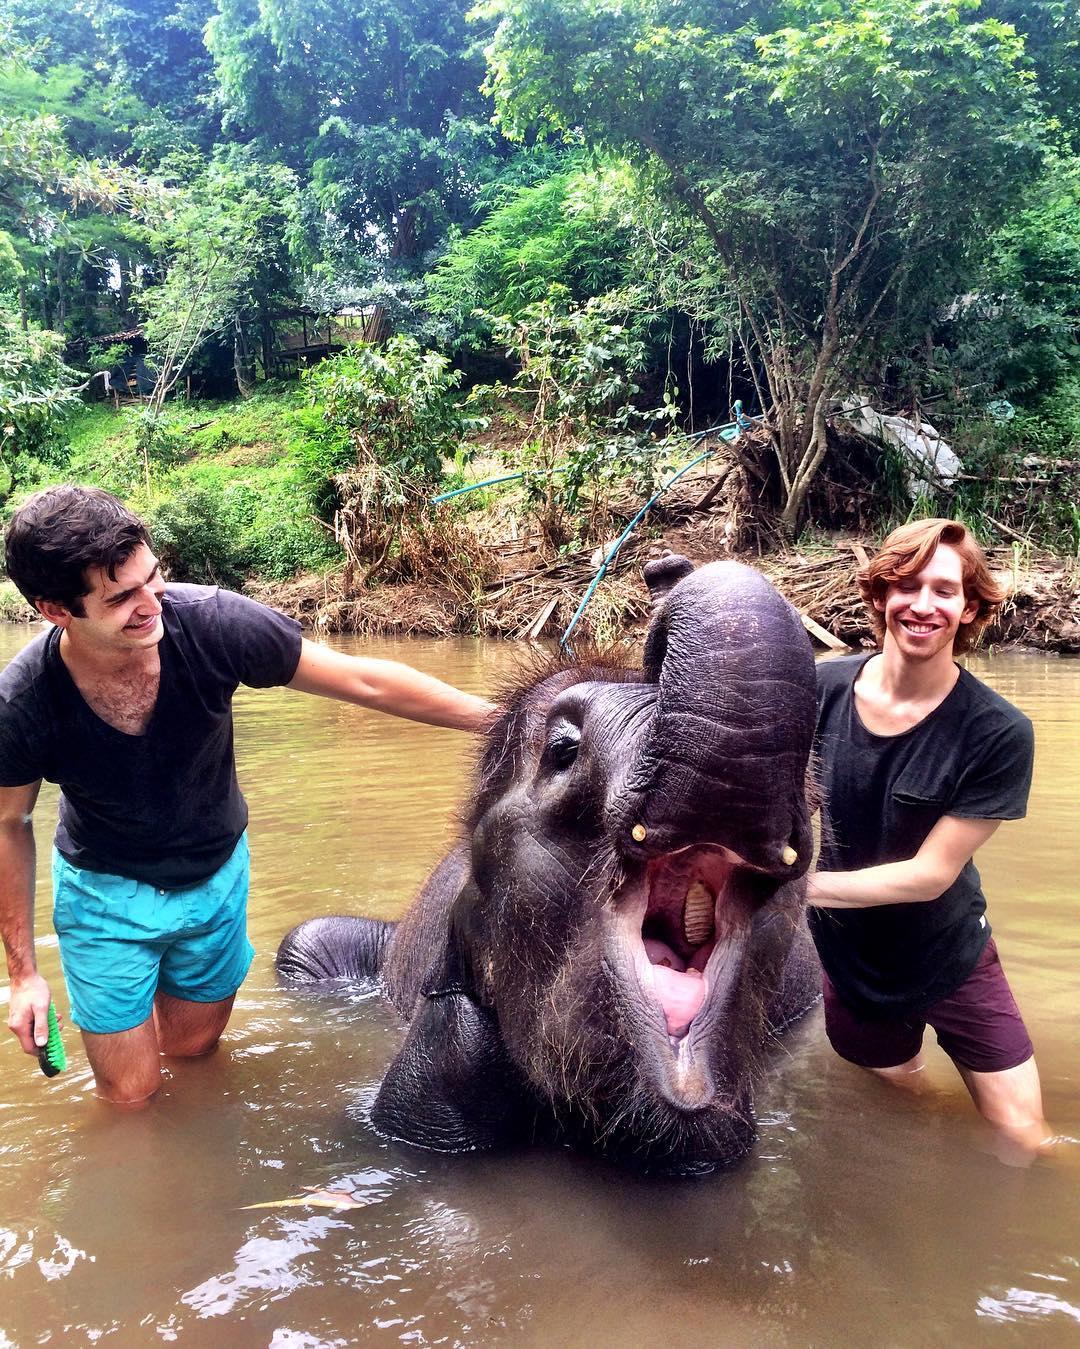 jack-new-york-holiday-advice-to-gay-thailand-weekly-wanderlust